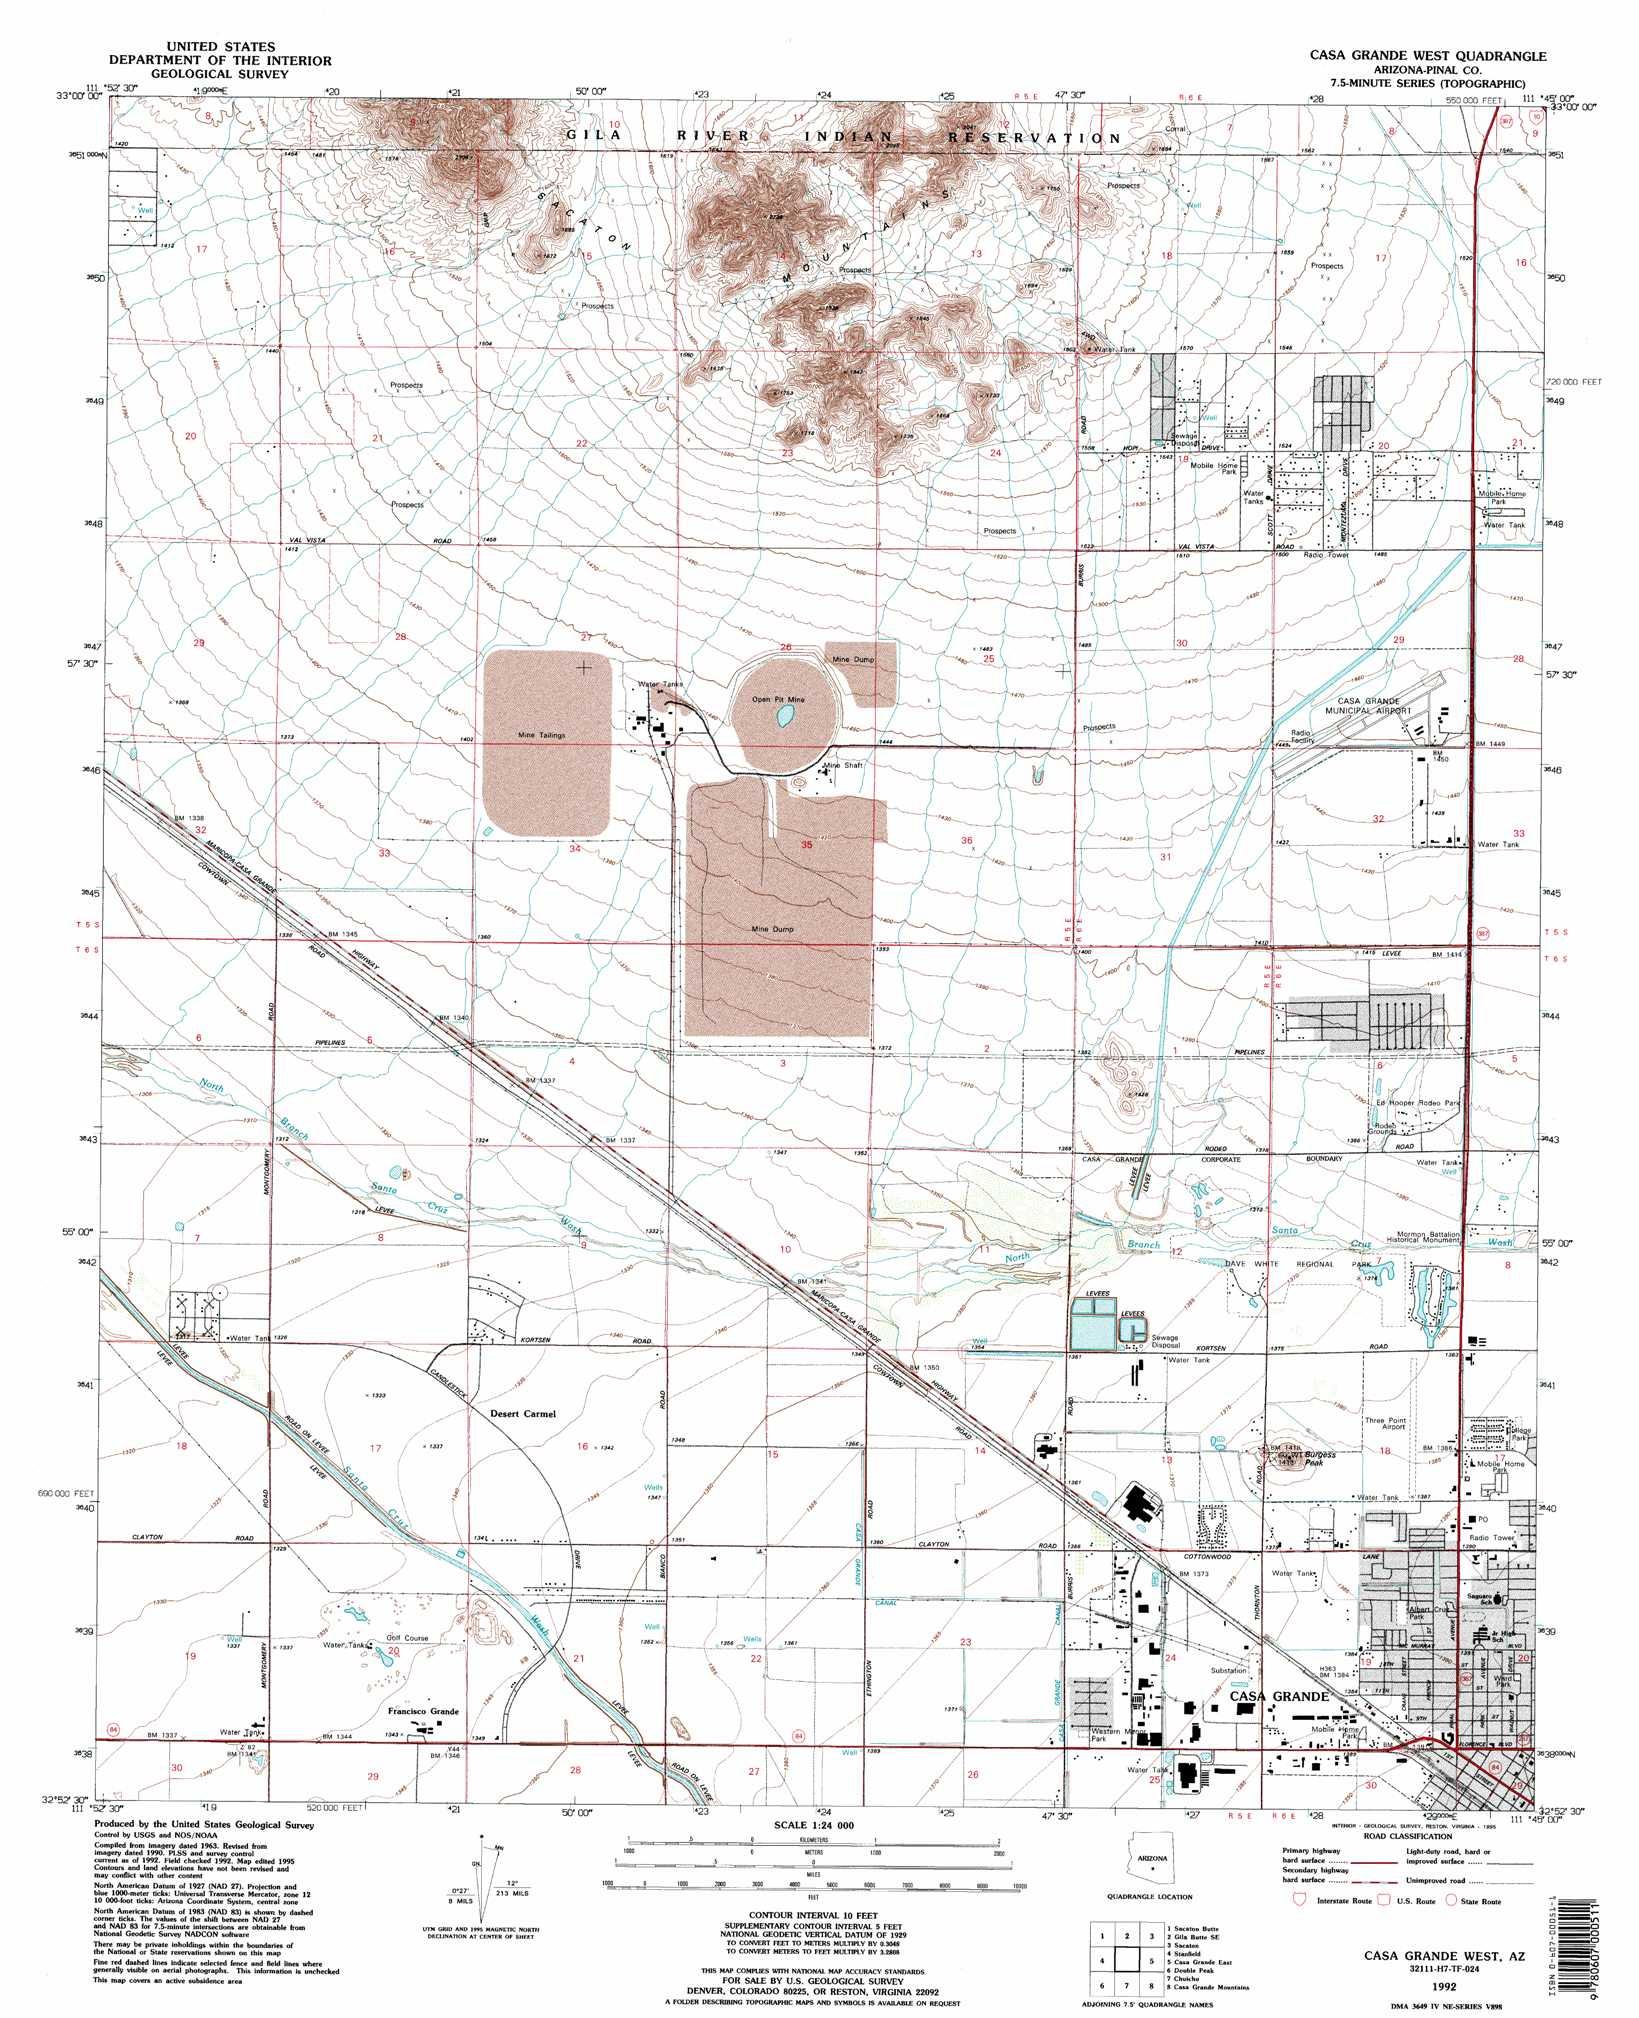 Casa Grande West topographic map, AZ - USGS Topo Quad 32111h7 on